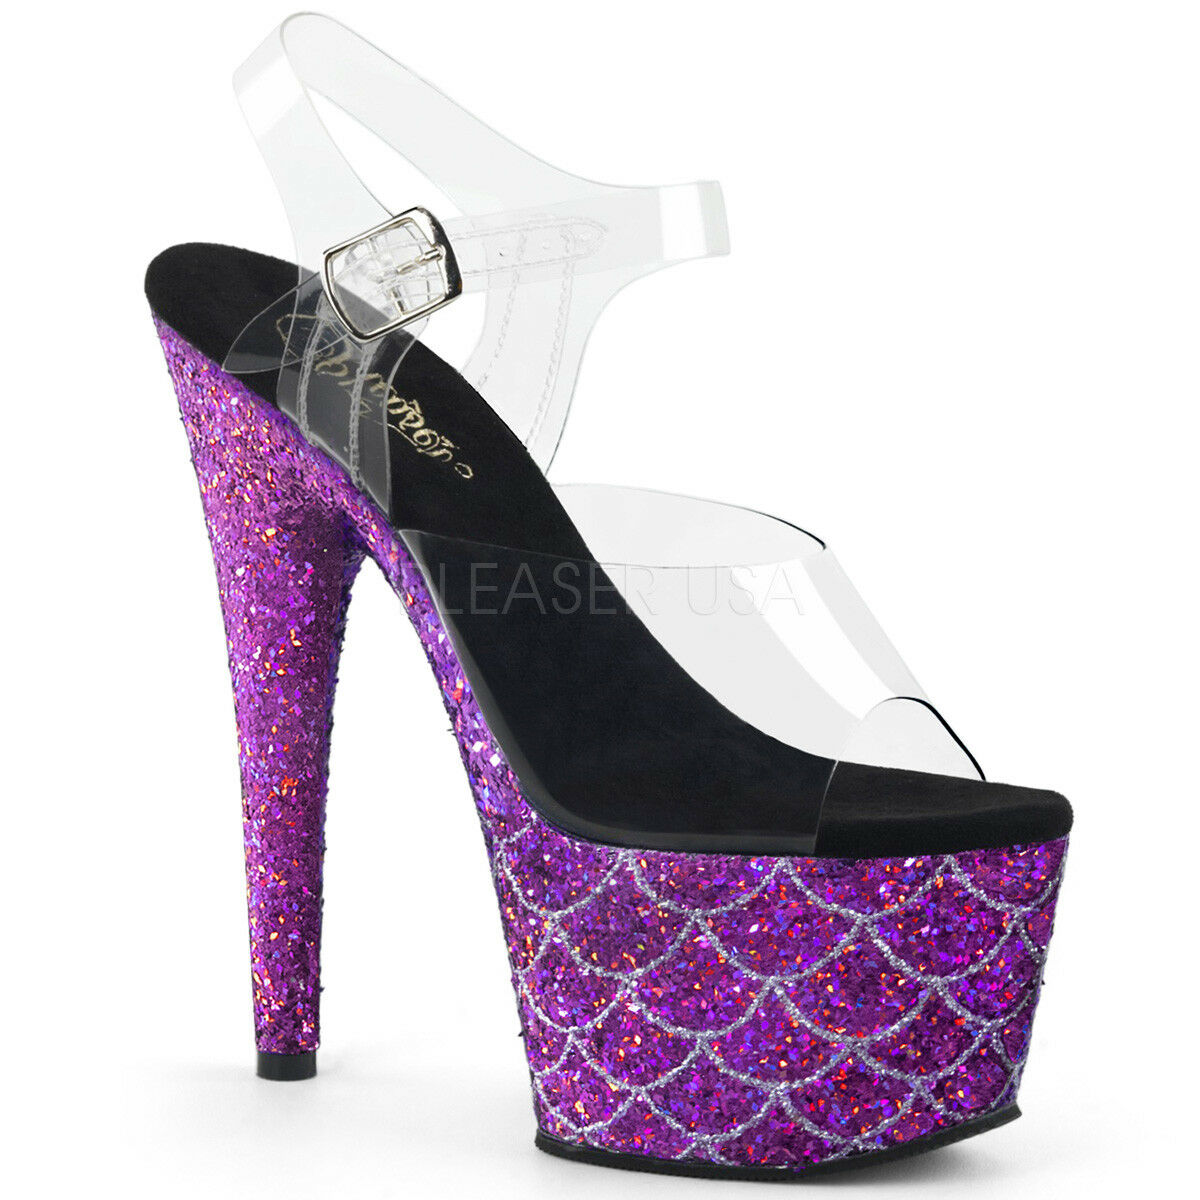 PLEASER 7  Heel Purple Glitter Mermaid Platform Ankle Strap Stripper shoes